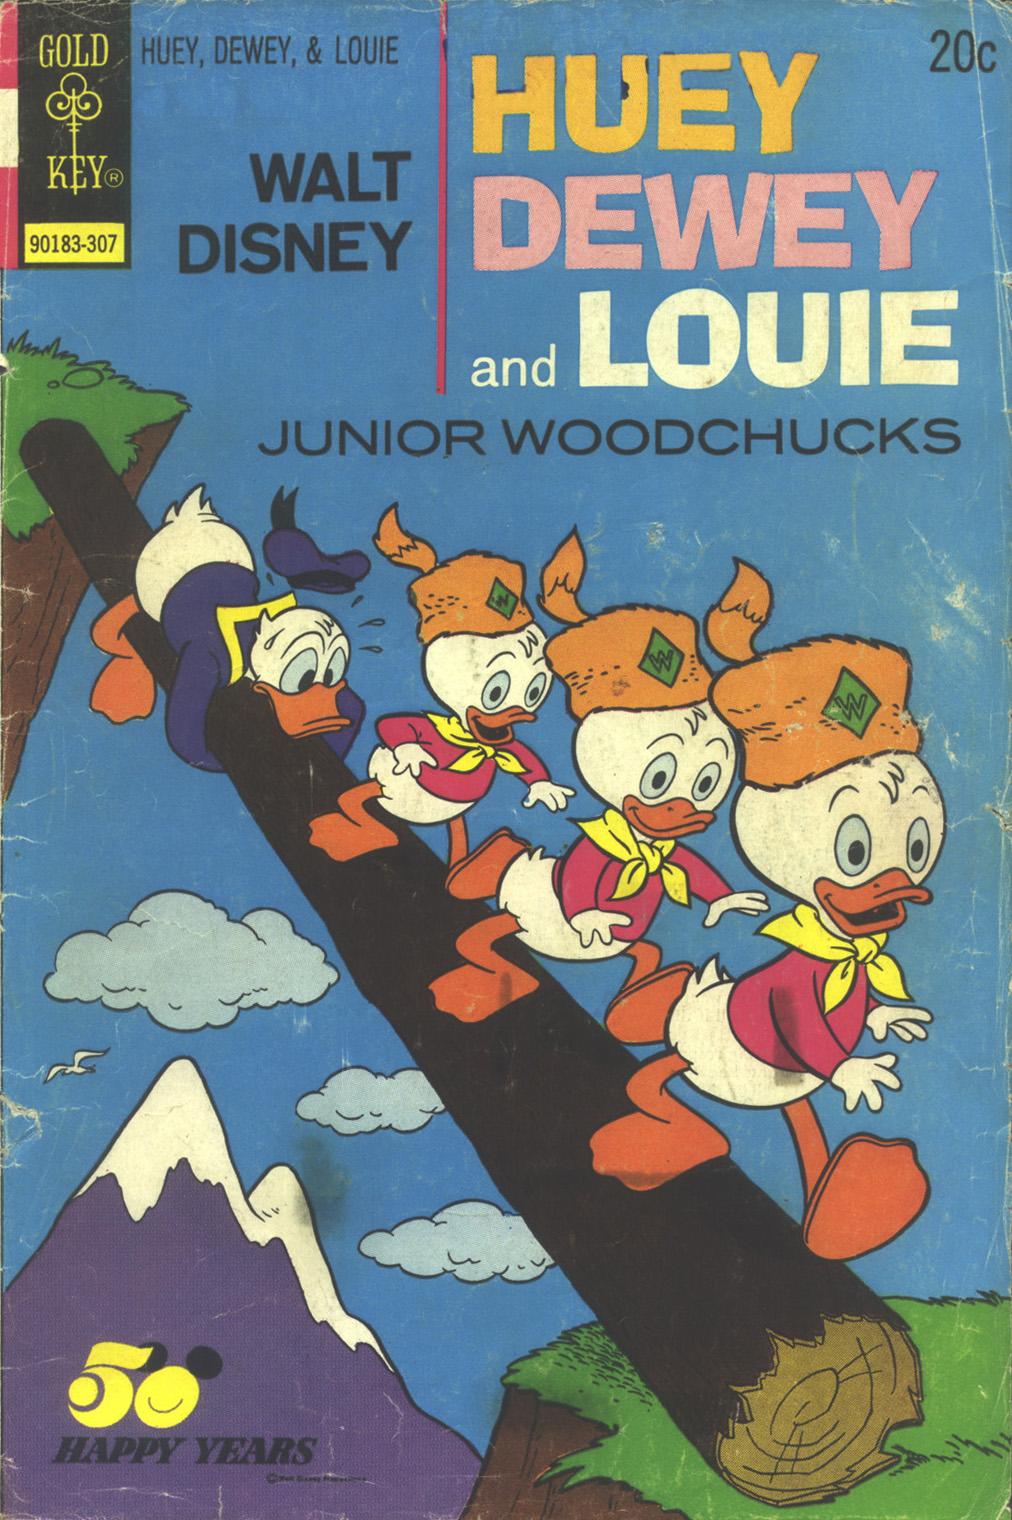 Huey, Dewey, and Louie Junior Woodchucks 21 Page 1